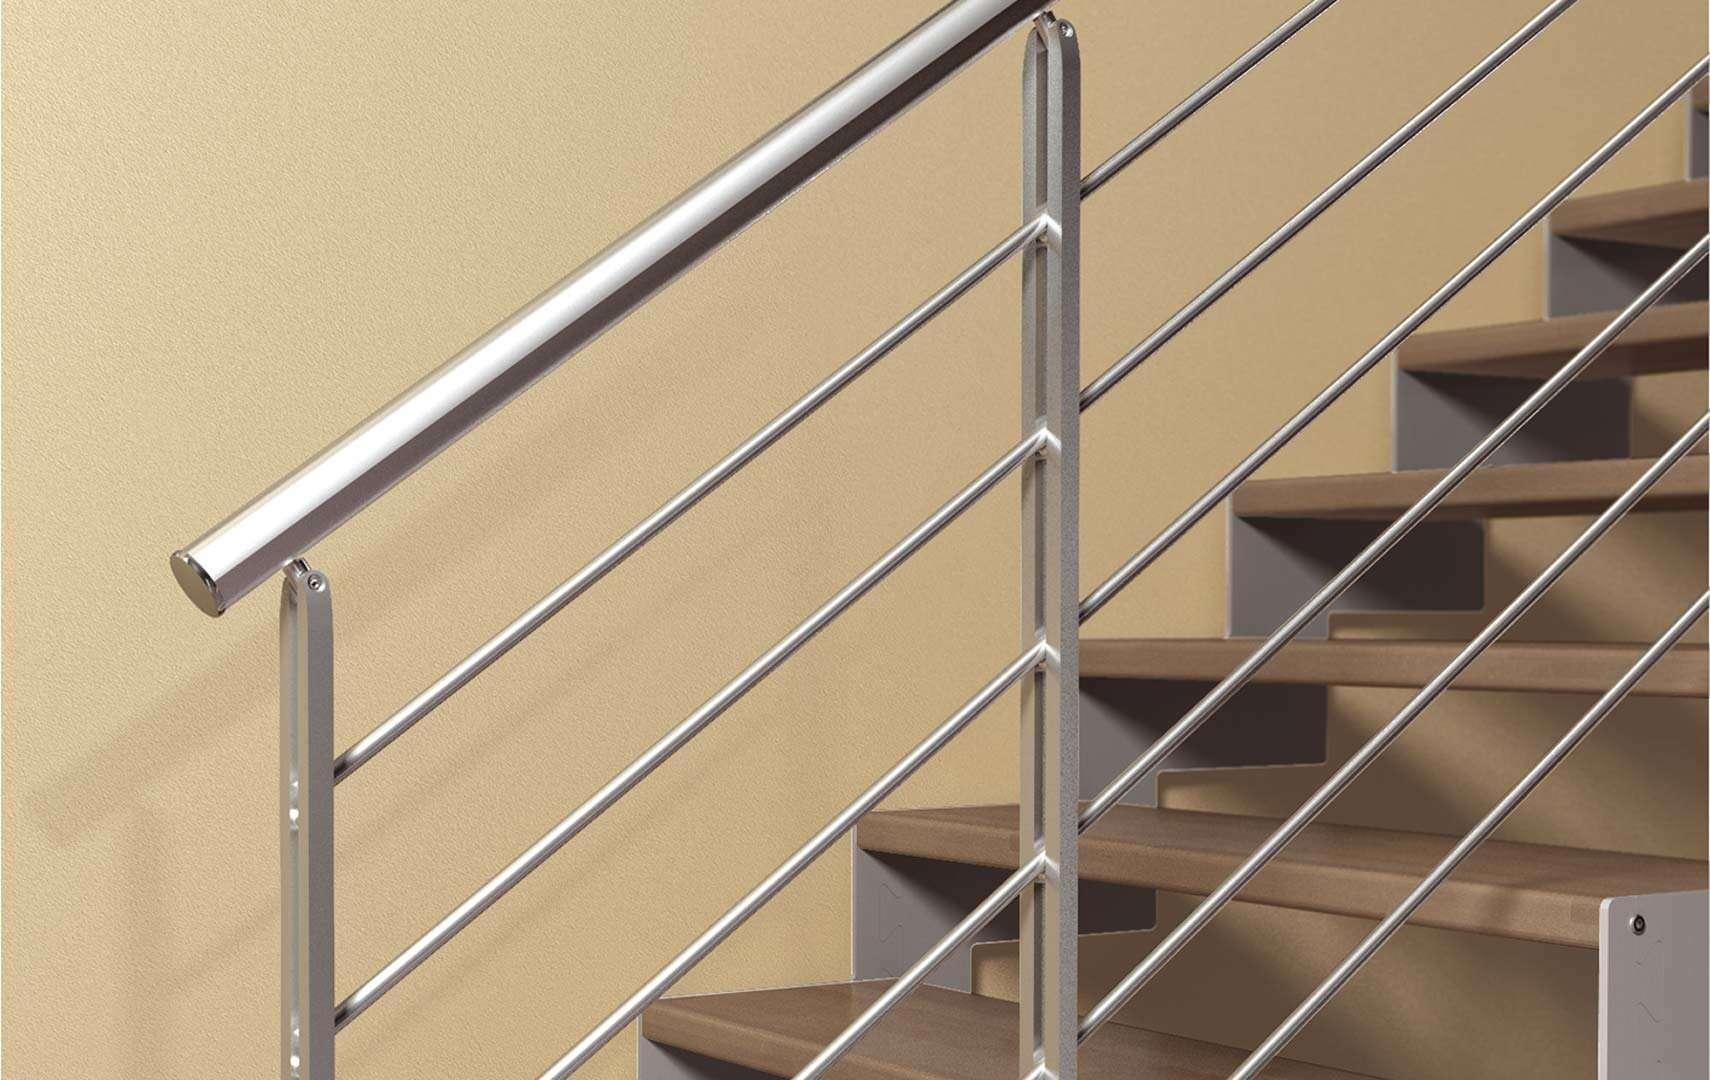 main courante design beautiful main courante escalier encastre clairante et autres ides design. Black Bedroom Furniture Sets. Home Design Ideas